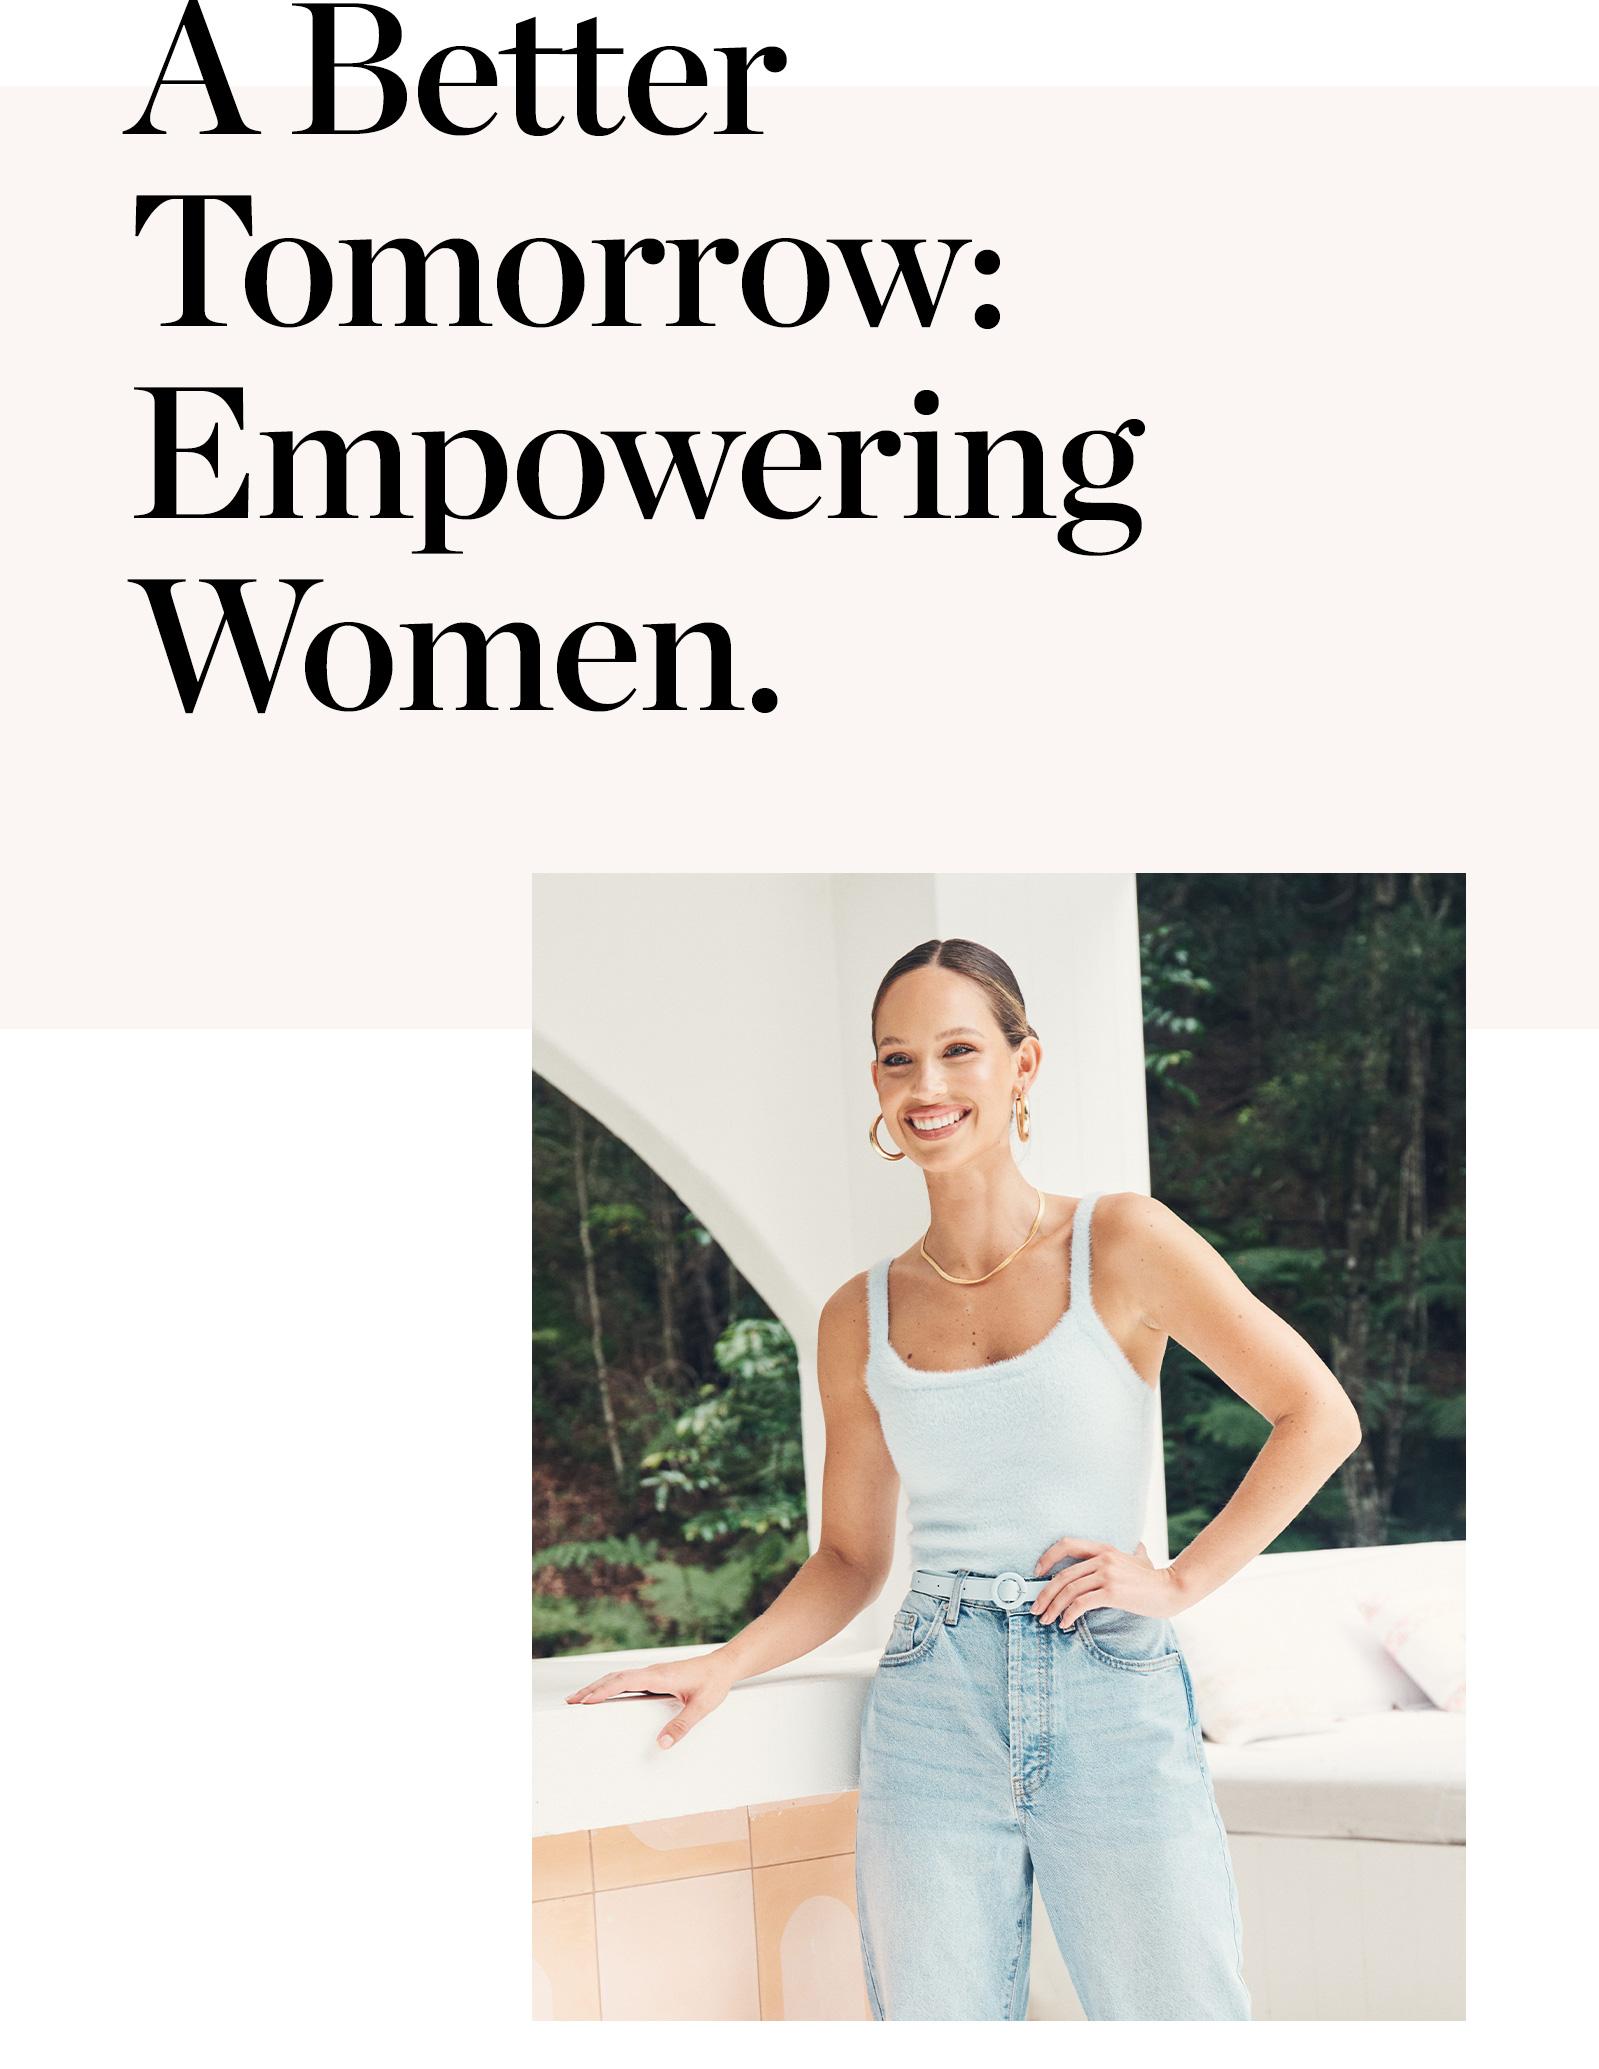 A Better Tomorrow - Empowering Women